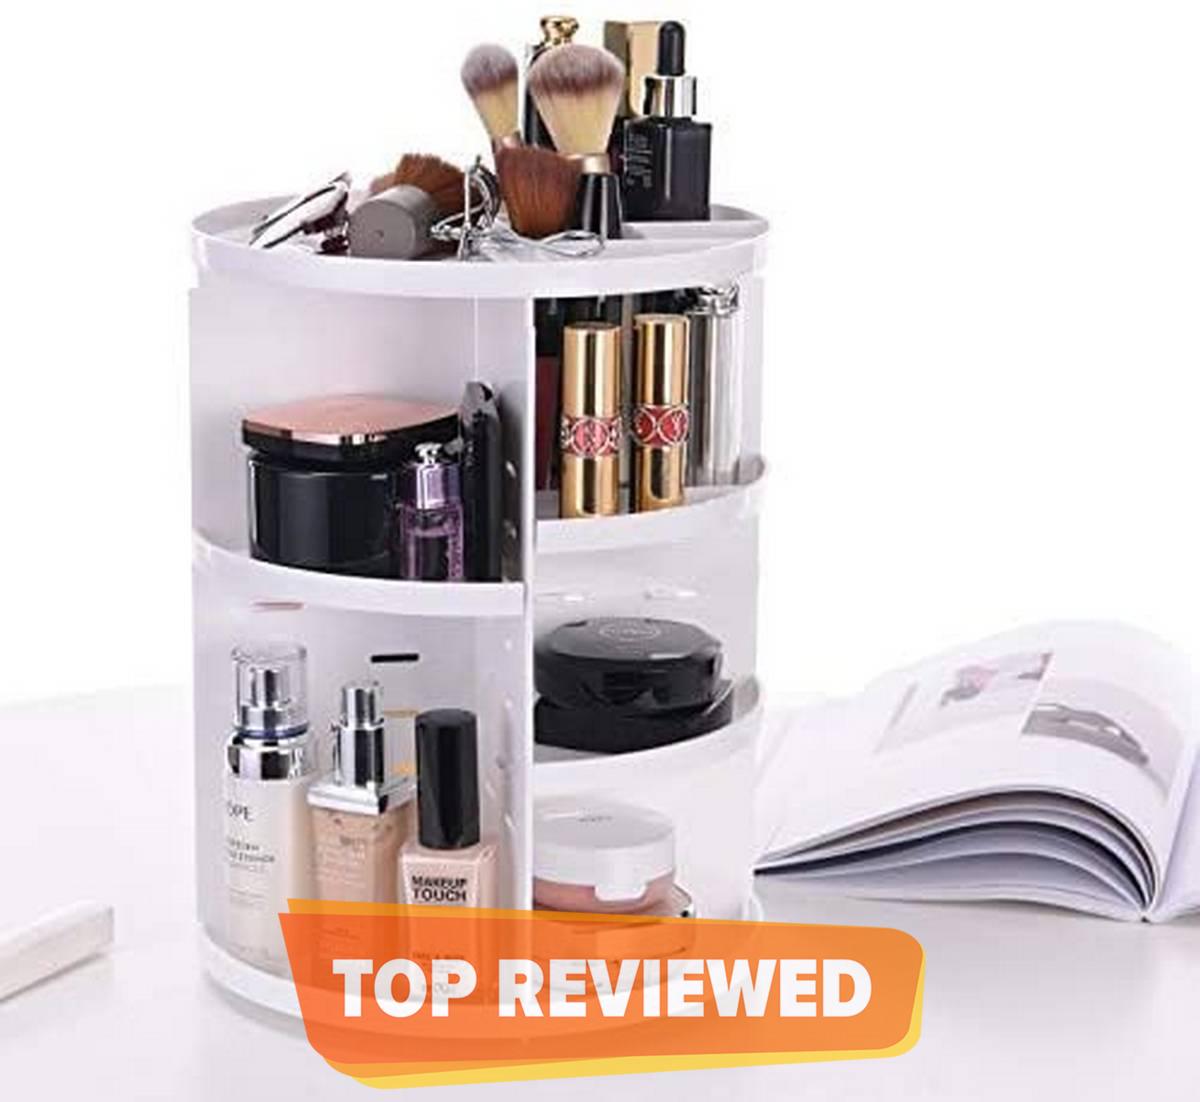 360 Rotating Makeup Organizer, DIY Adjustable Makeup Carousel Spinning Holder Storage Rack, Large Capacity Make up Caddy Shelf Cosmetics Organizer Box, Great for Countertop